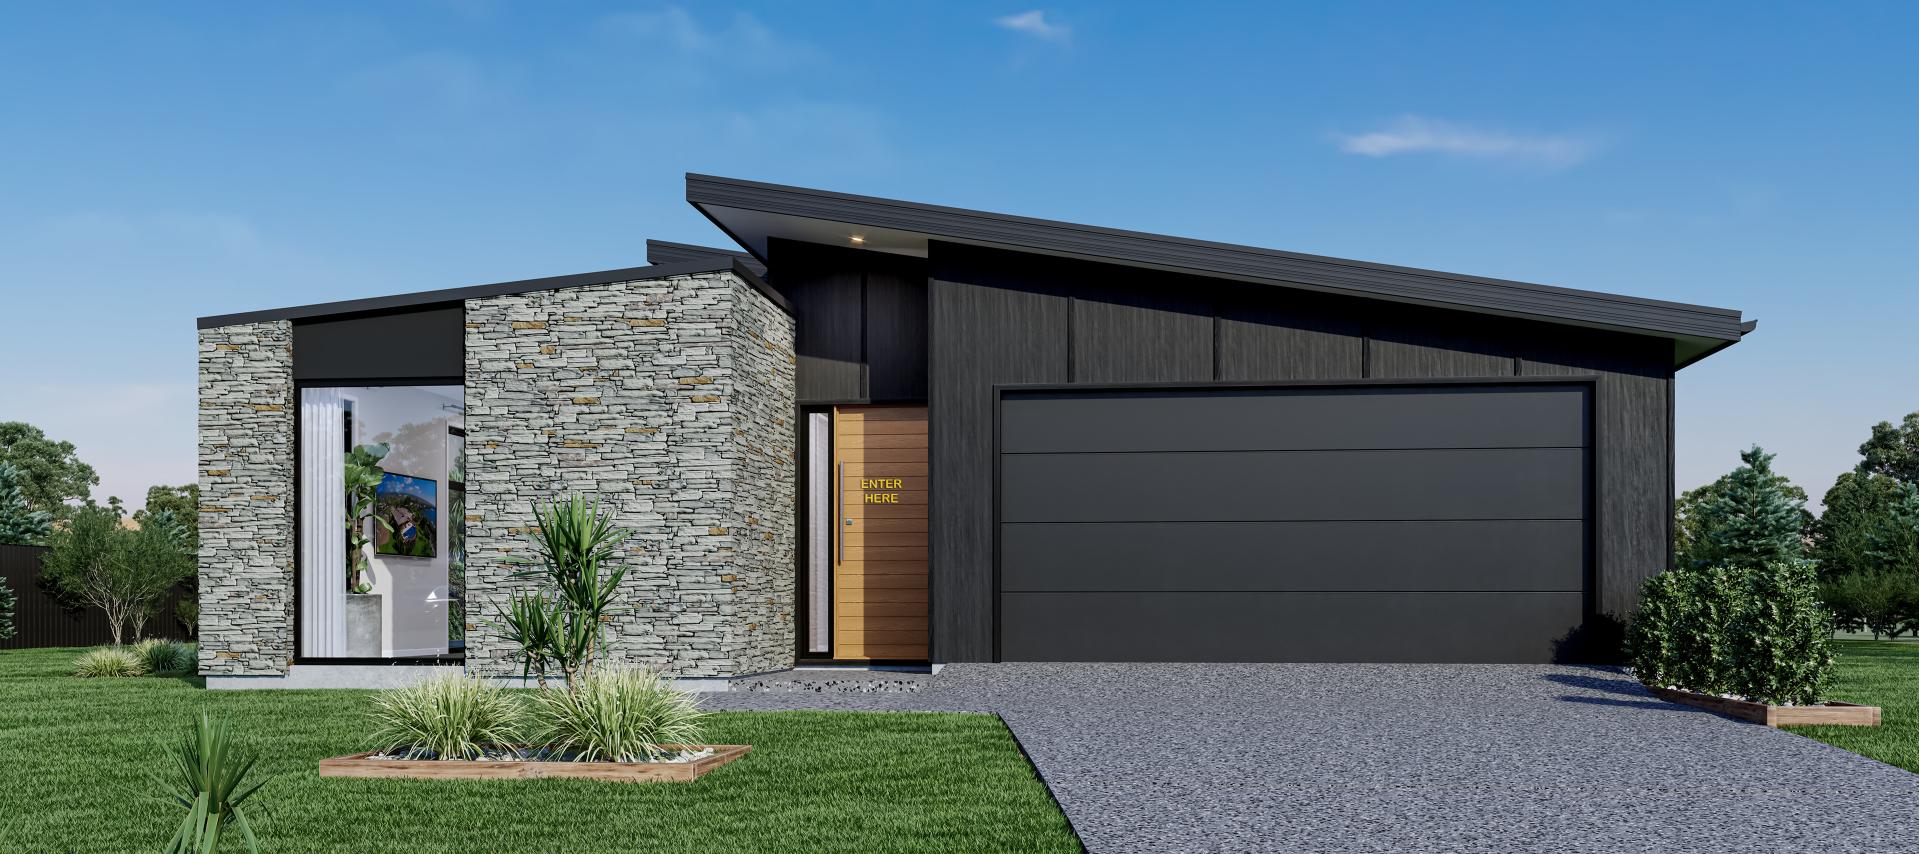 The House New Zealand Built